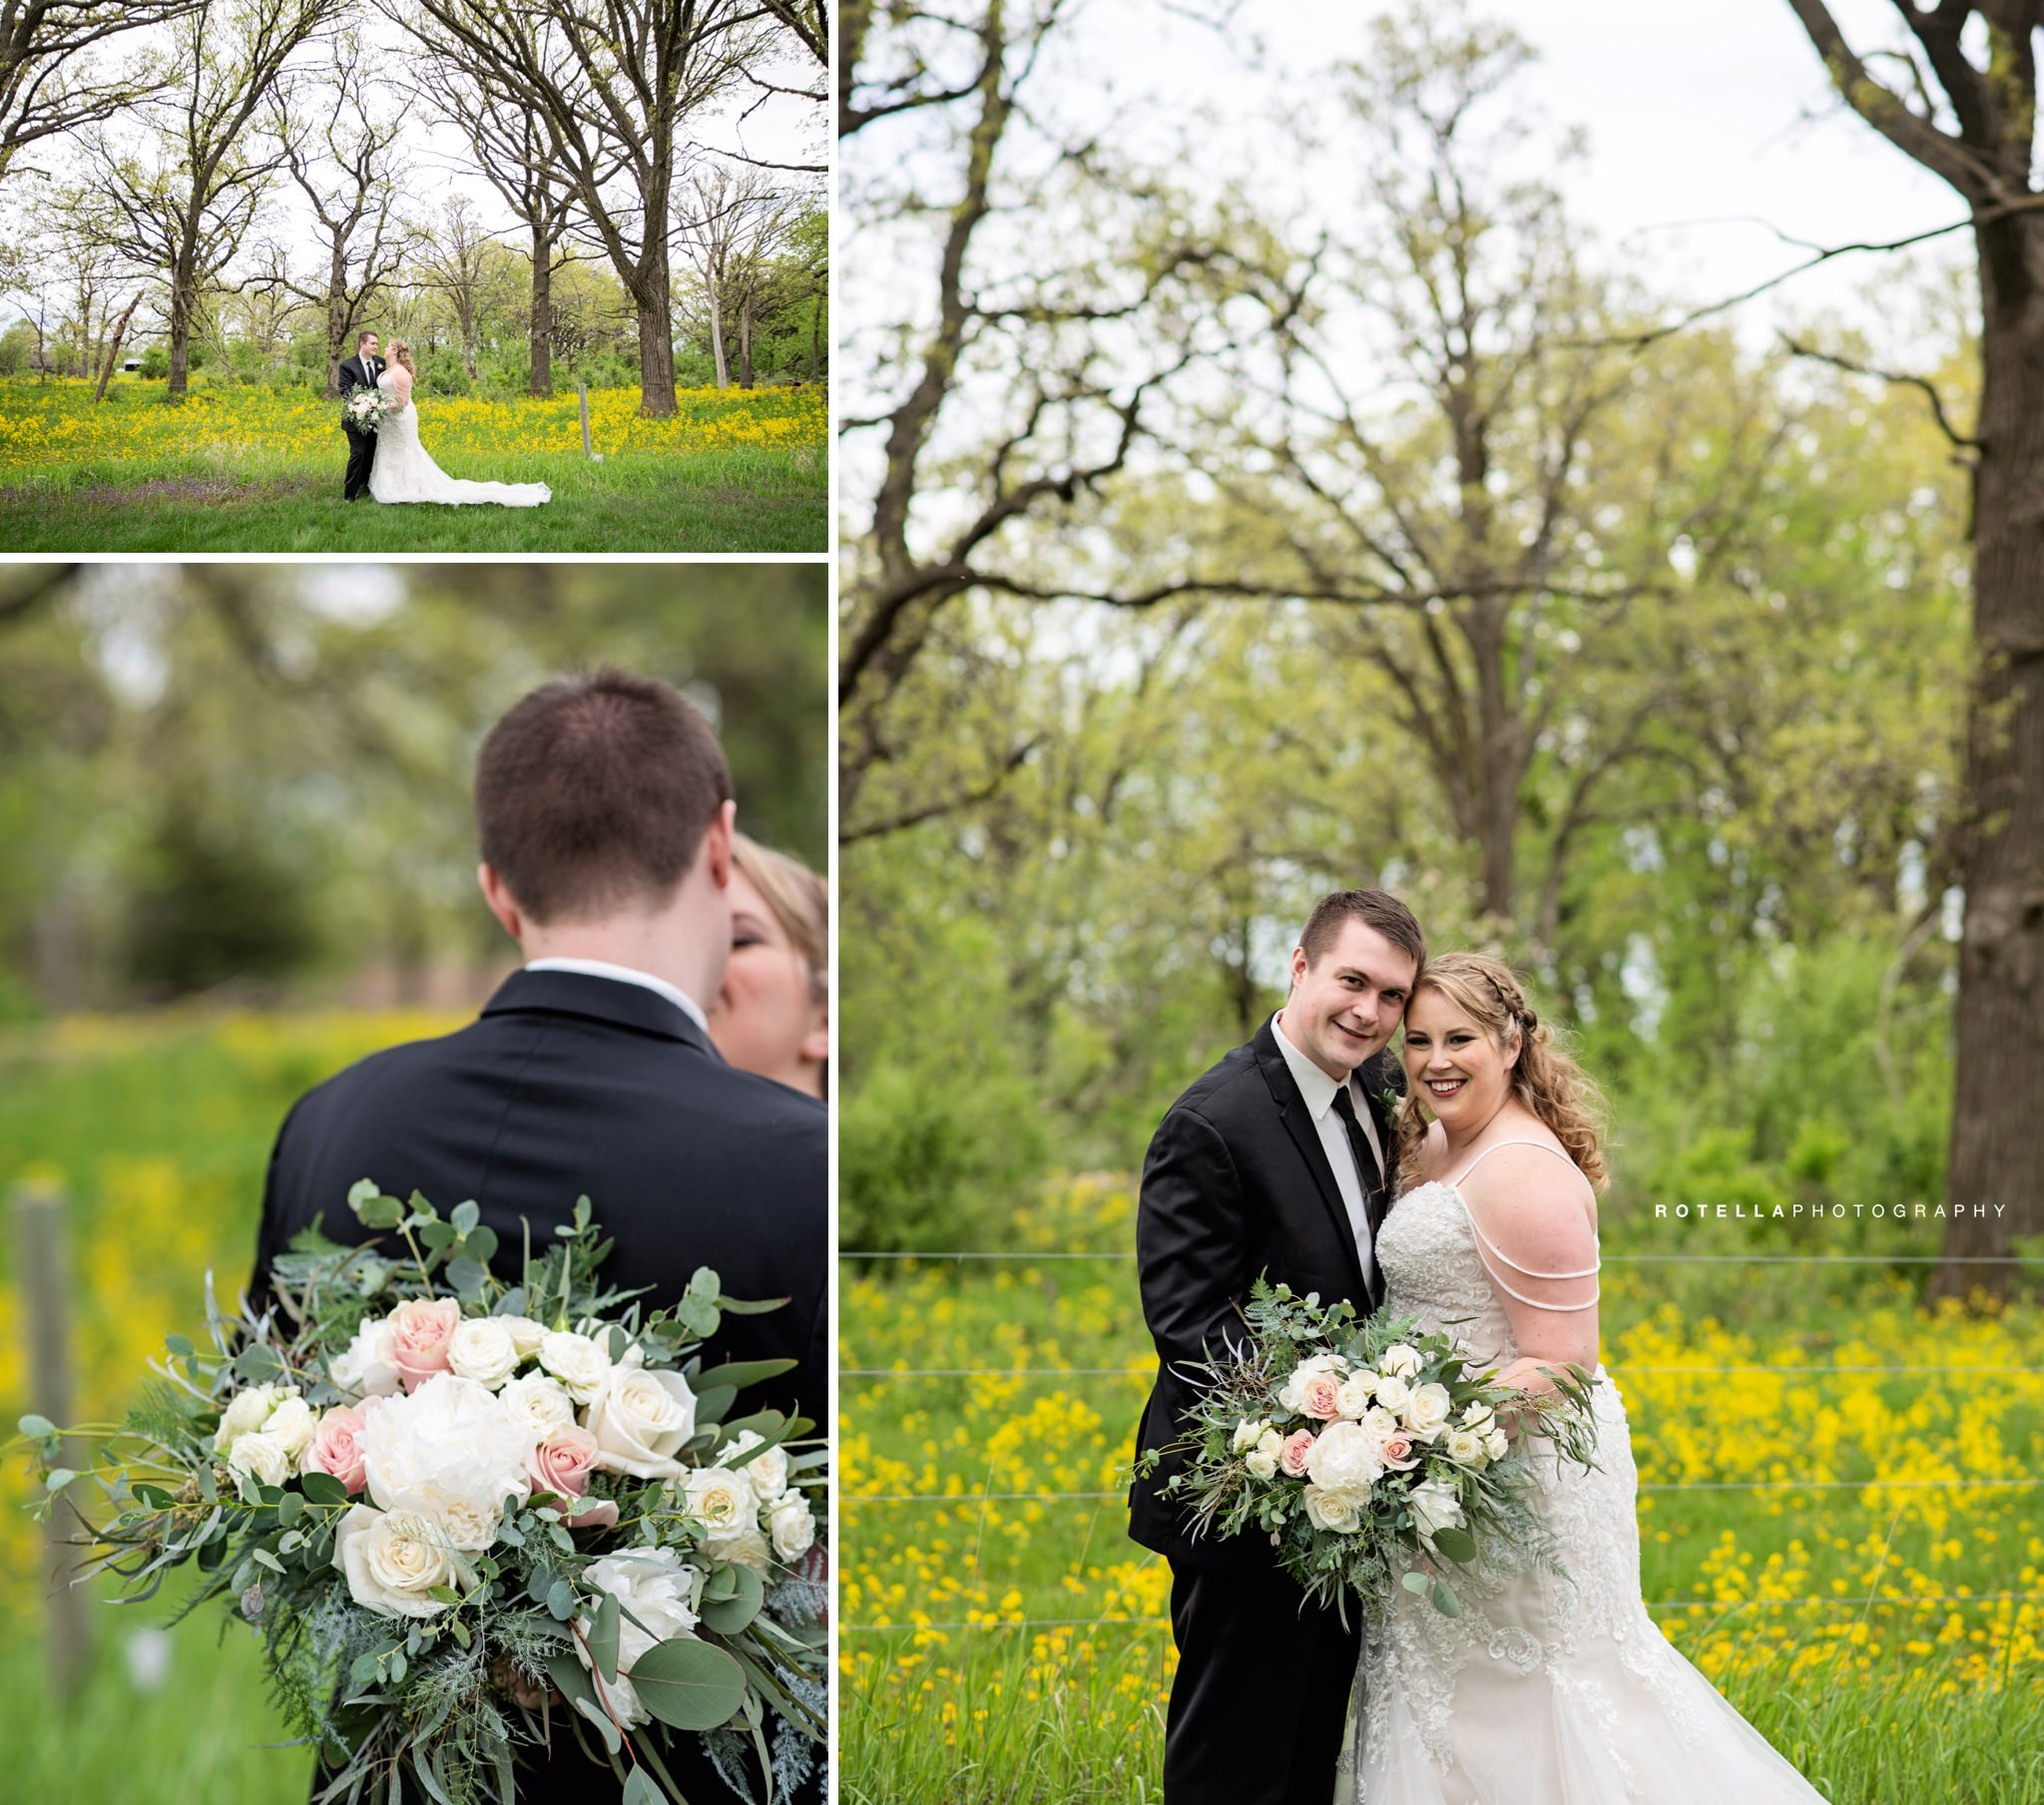 Cassie-Corbin-Wedding-05-25-2019-Rotella-Photography-PREV-97-243_BLOG.jpg